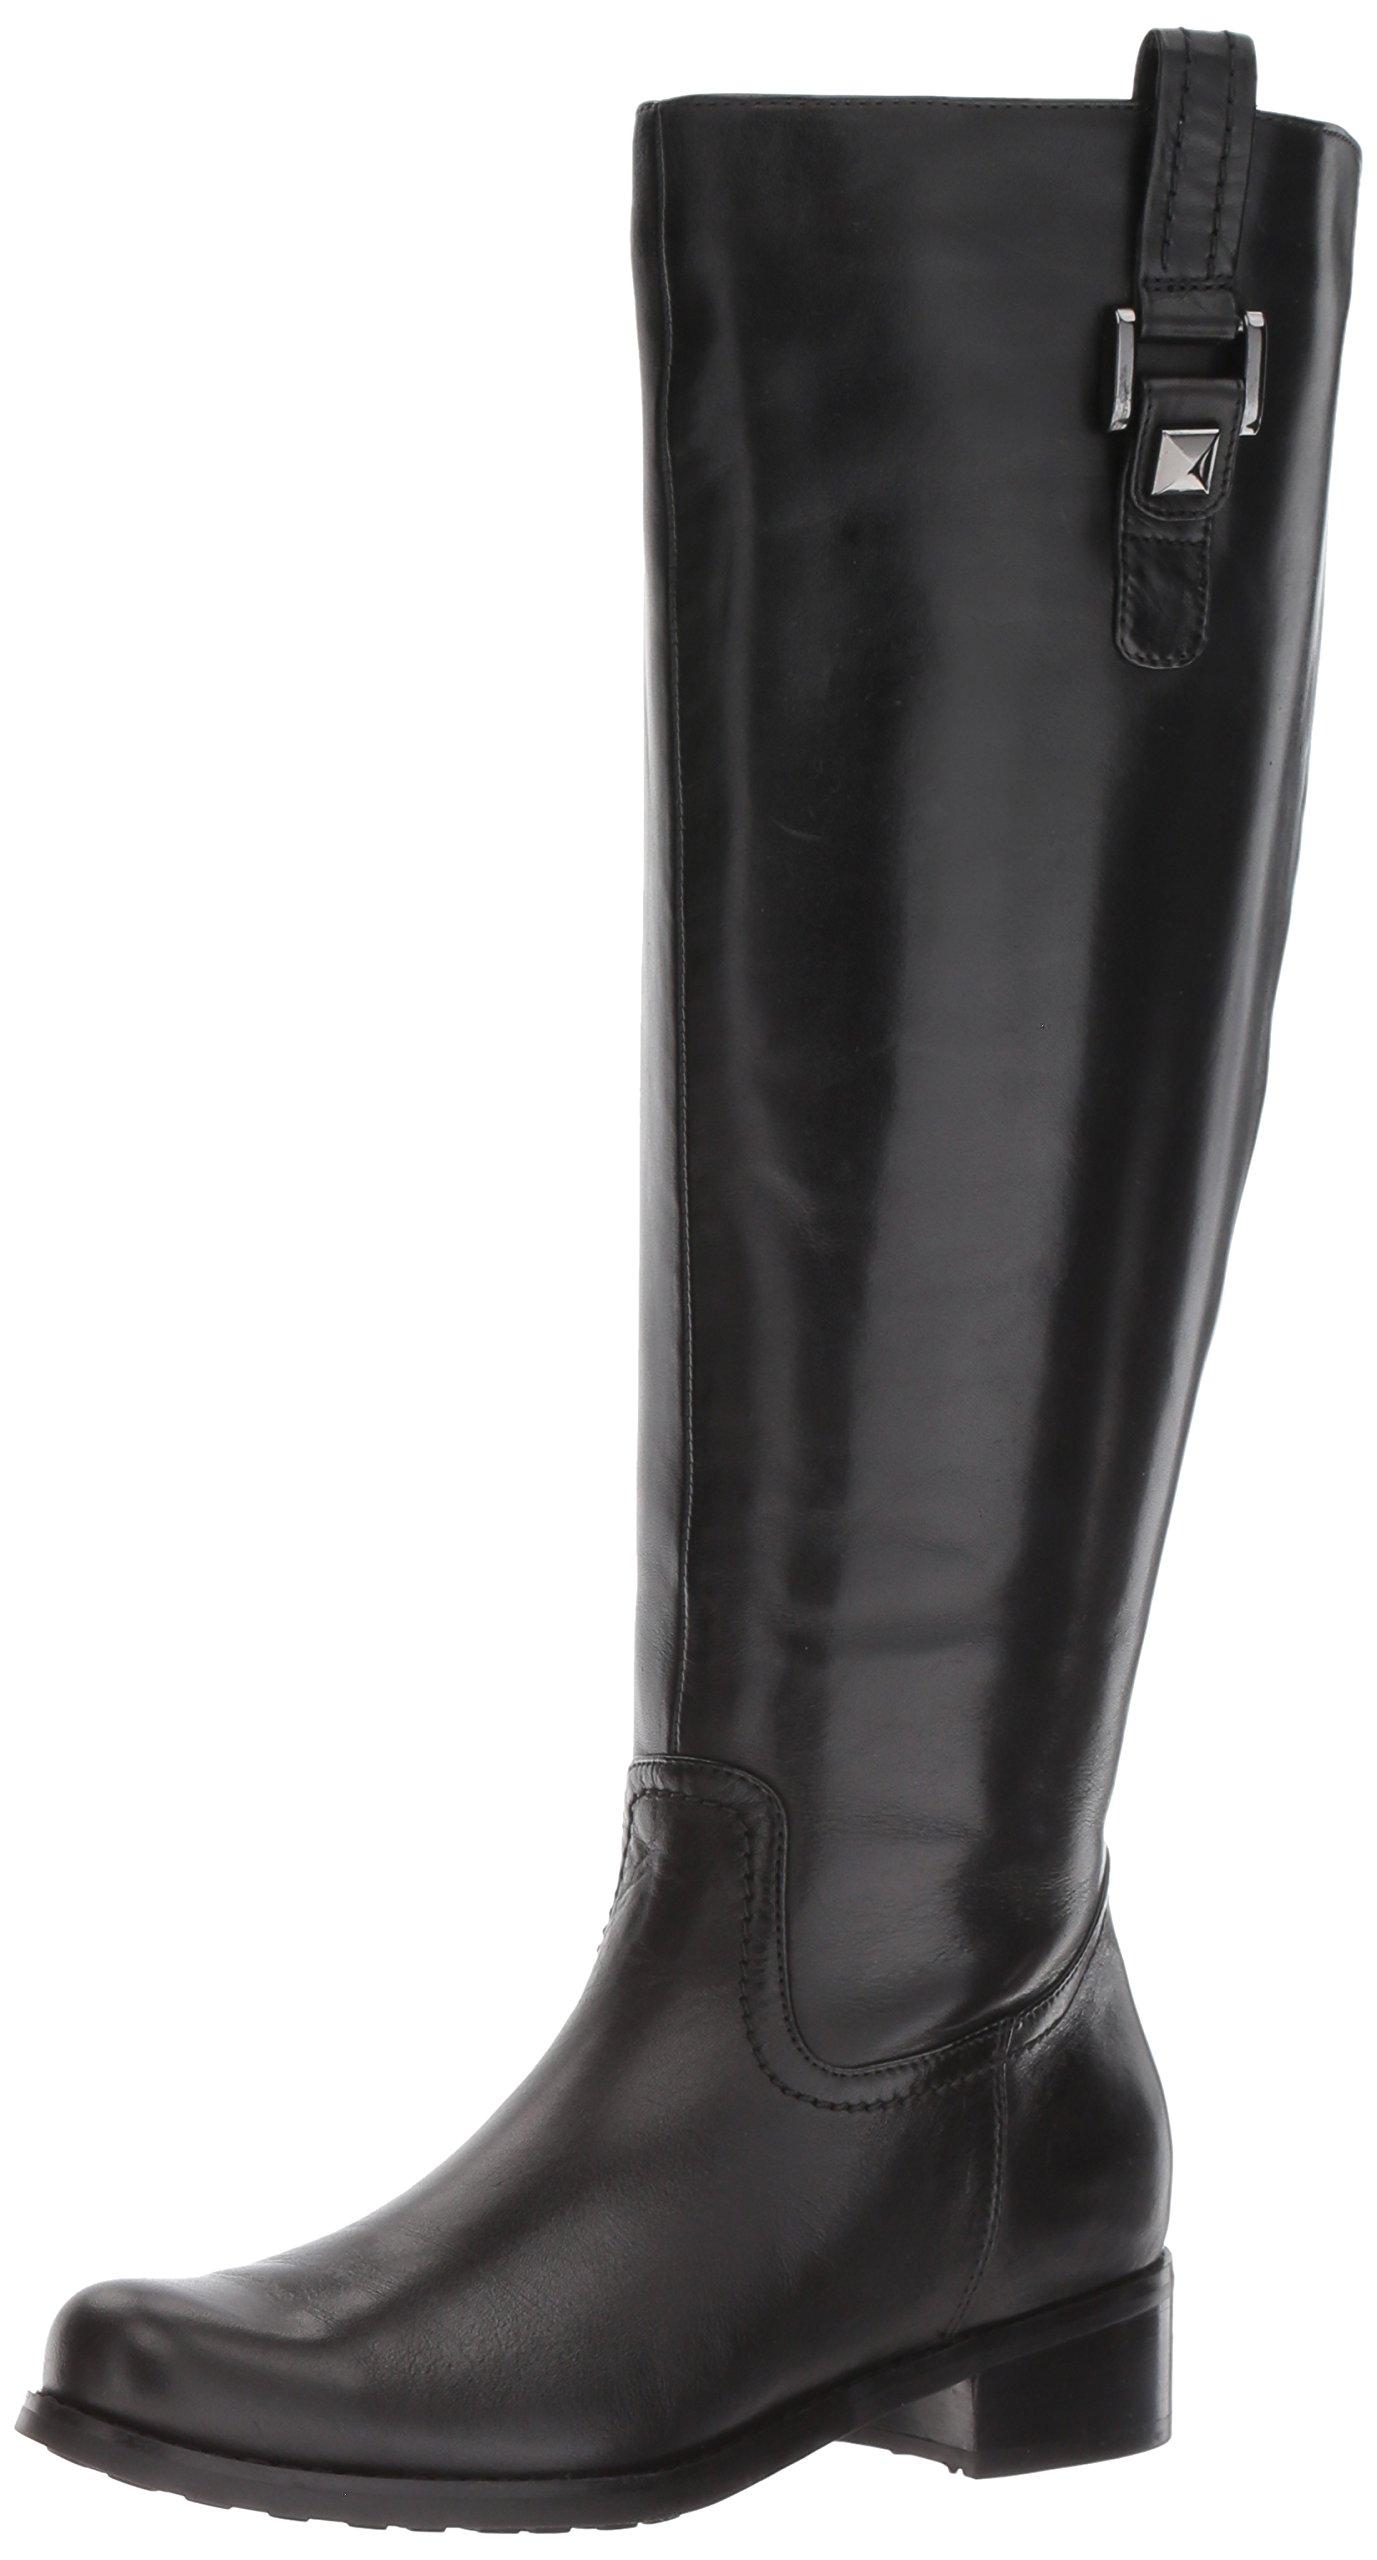 Blondo Women's Velvet WS Waterproof Riding Boot, Black, 8 M US